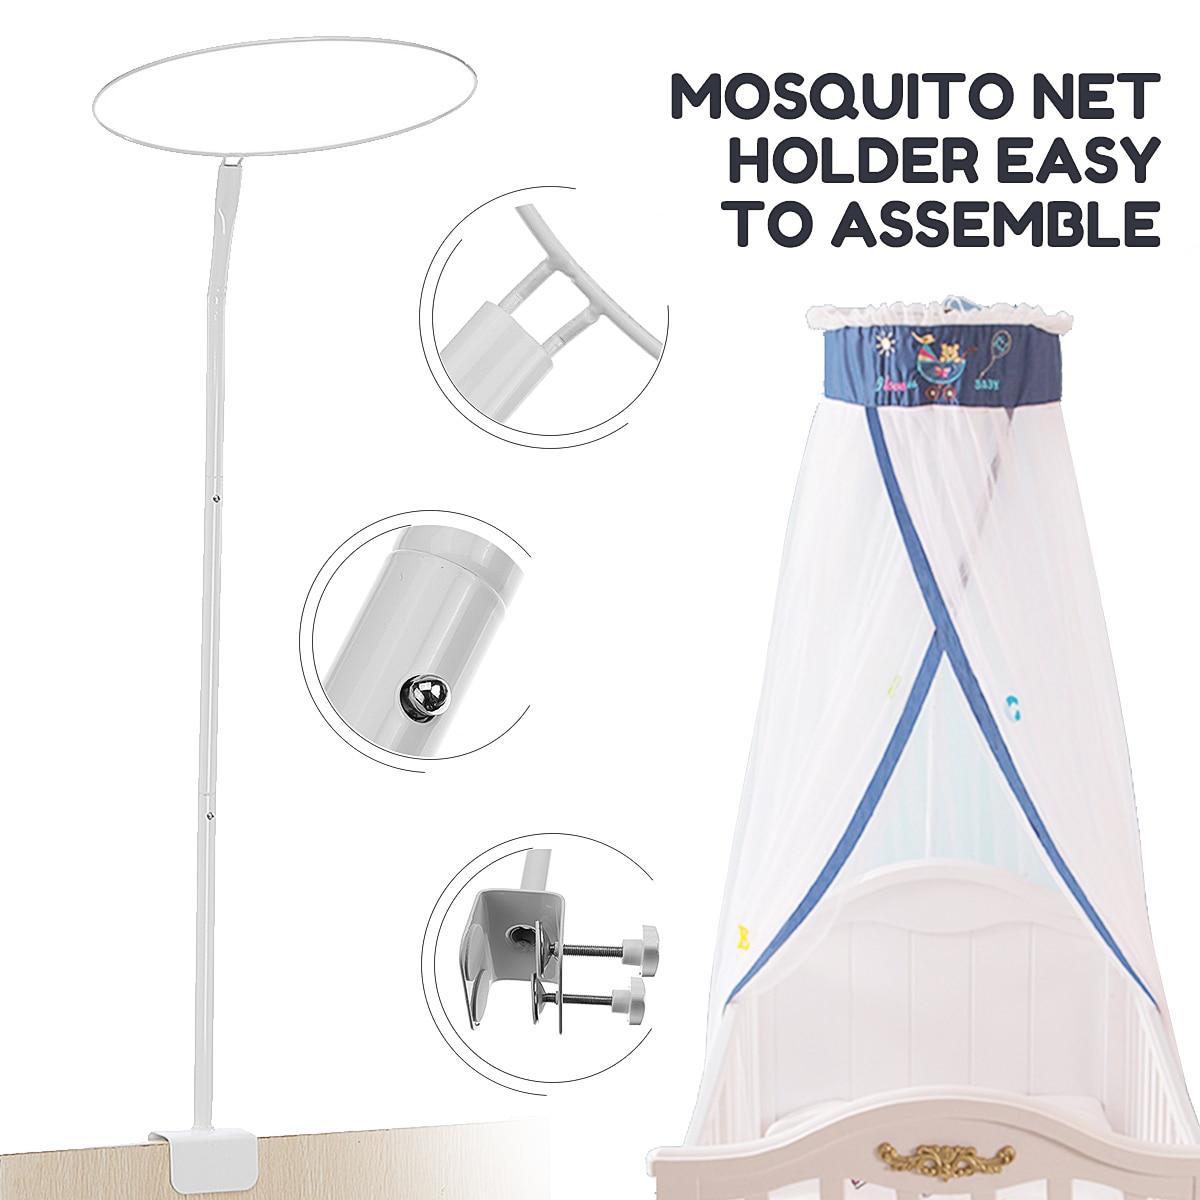 Summer Mosquito Net Stand Crib Net Holder Baby Crib Mosquito Netting Holder Universal Canopy Drape Holder Bed Support